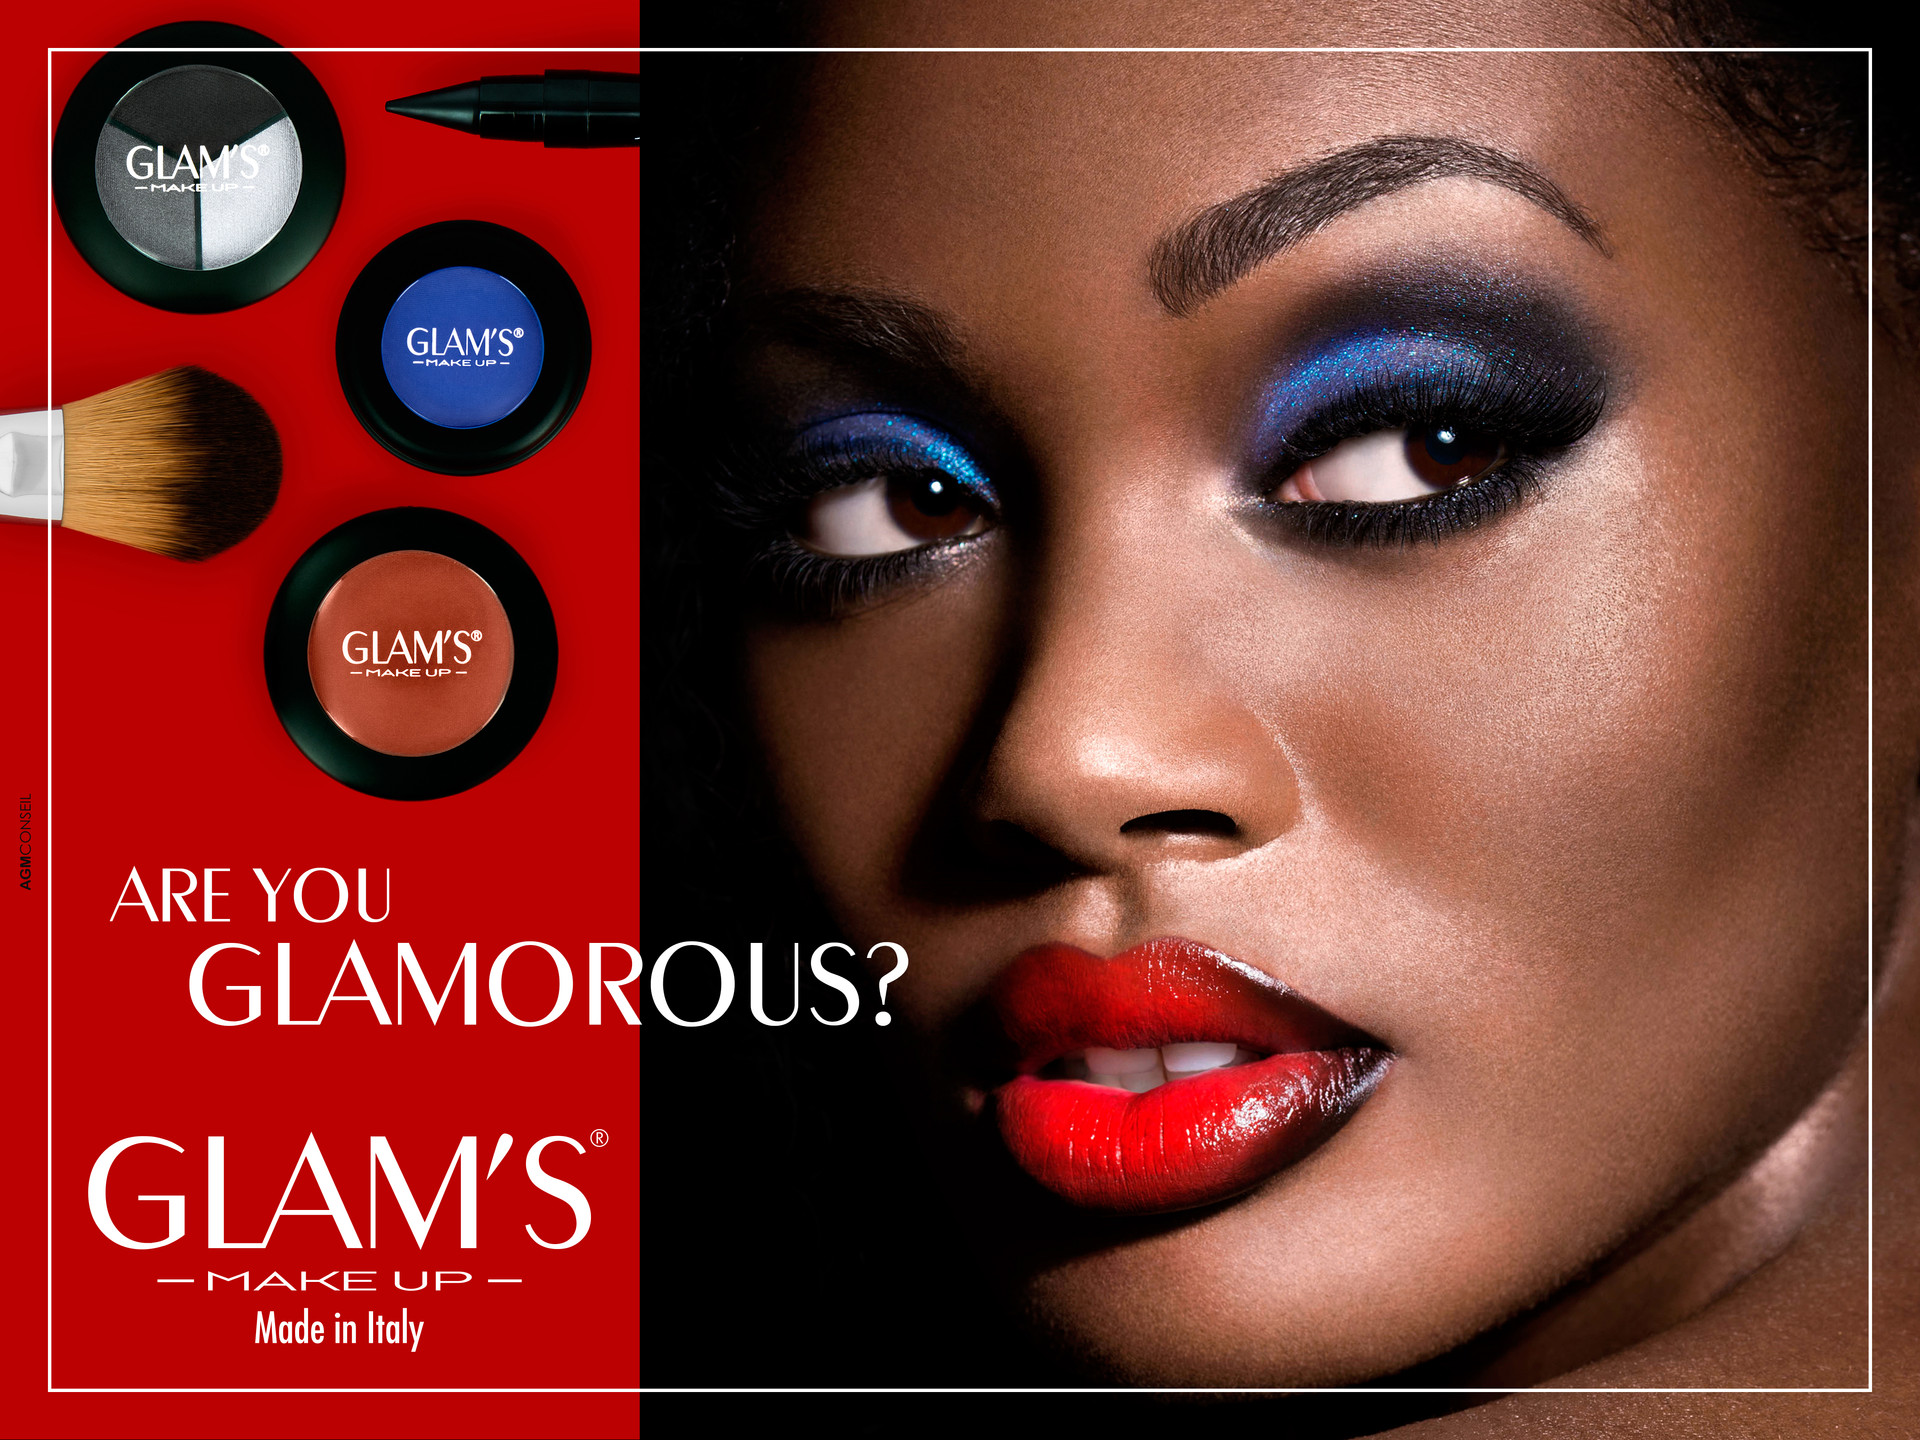 Glams looks